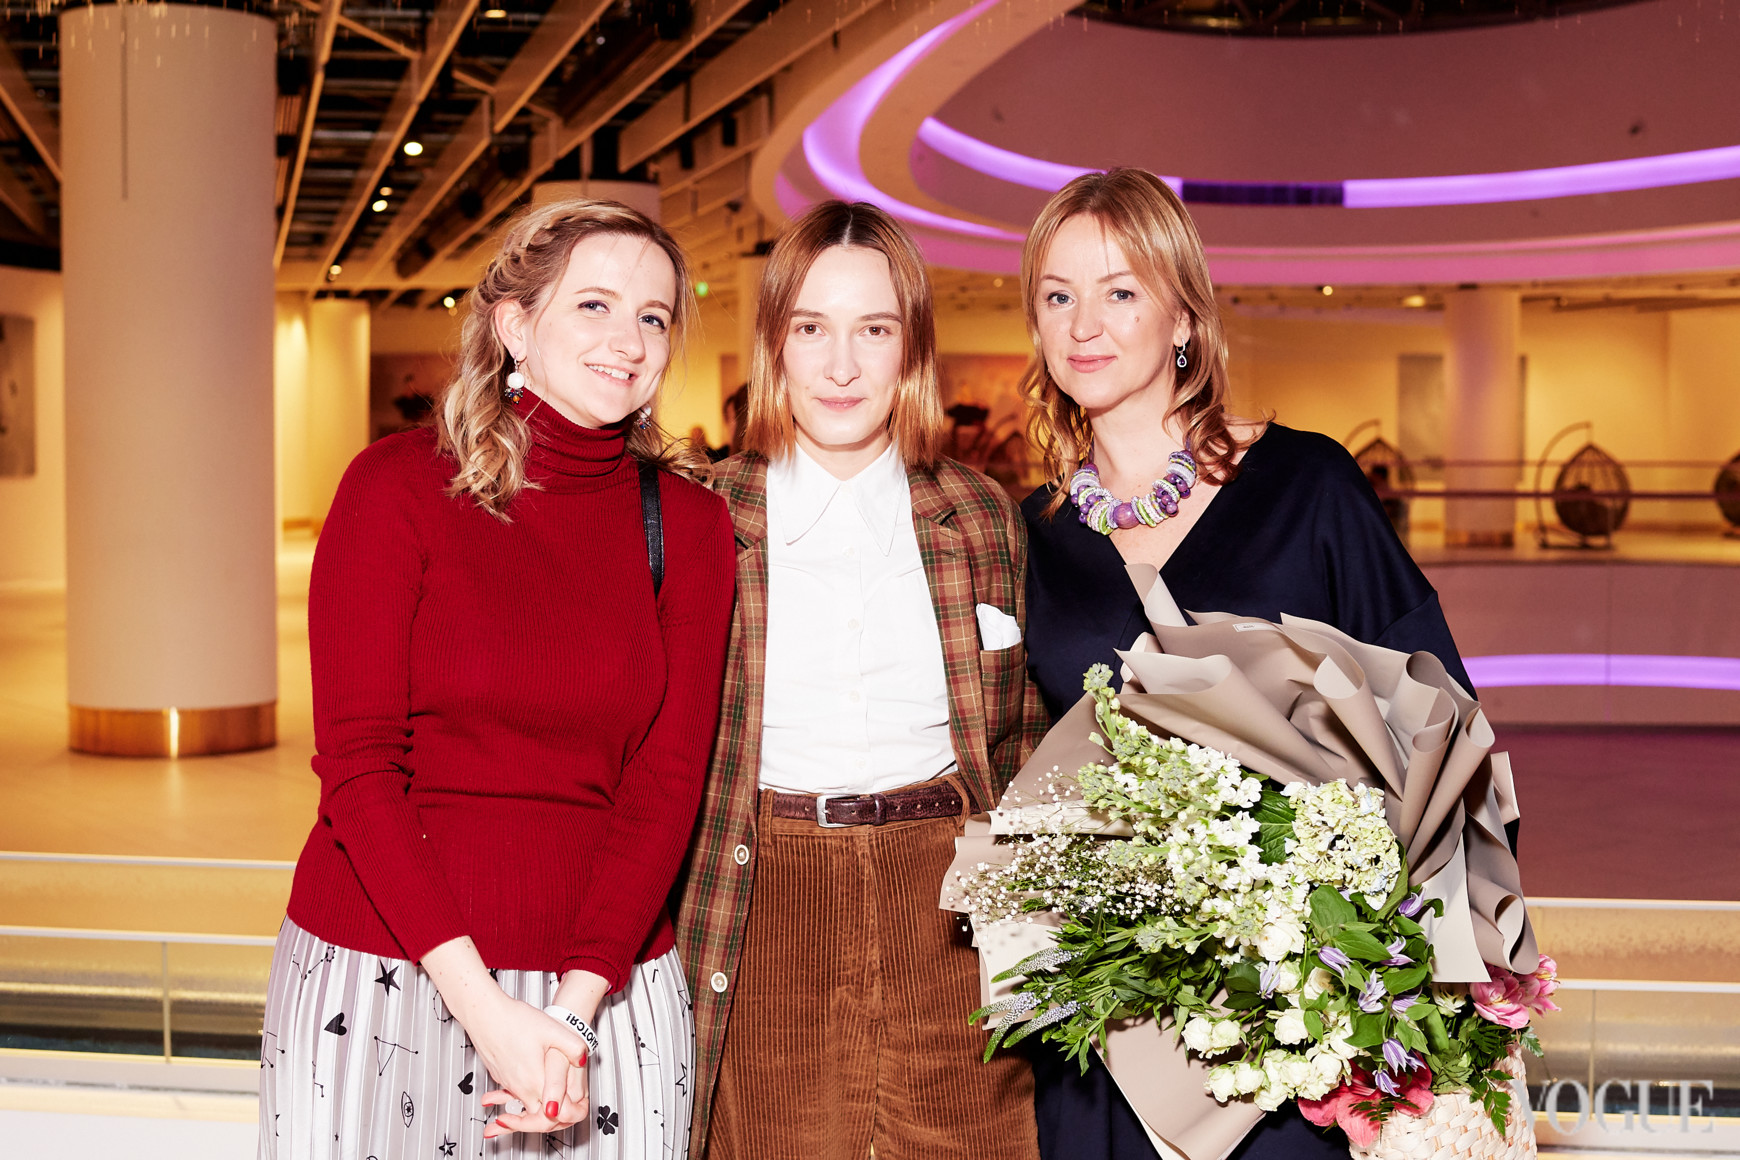 Анна Петрова, Ольга Сушко, Натали Гурьева